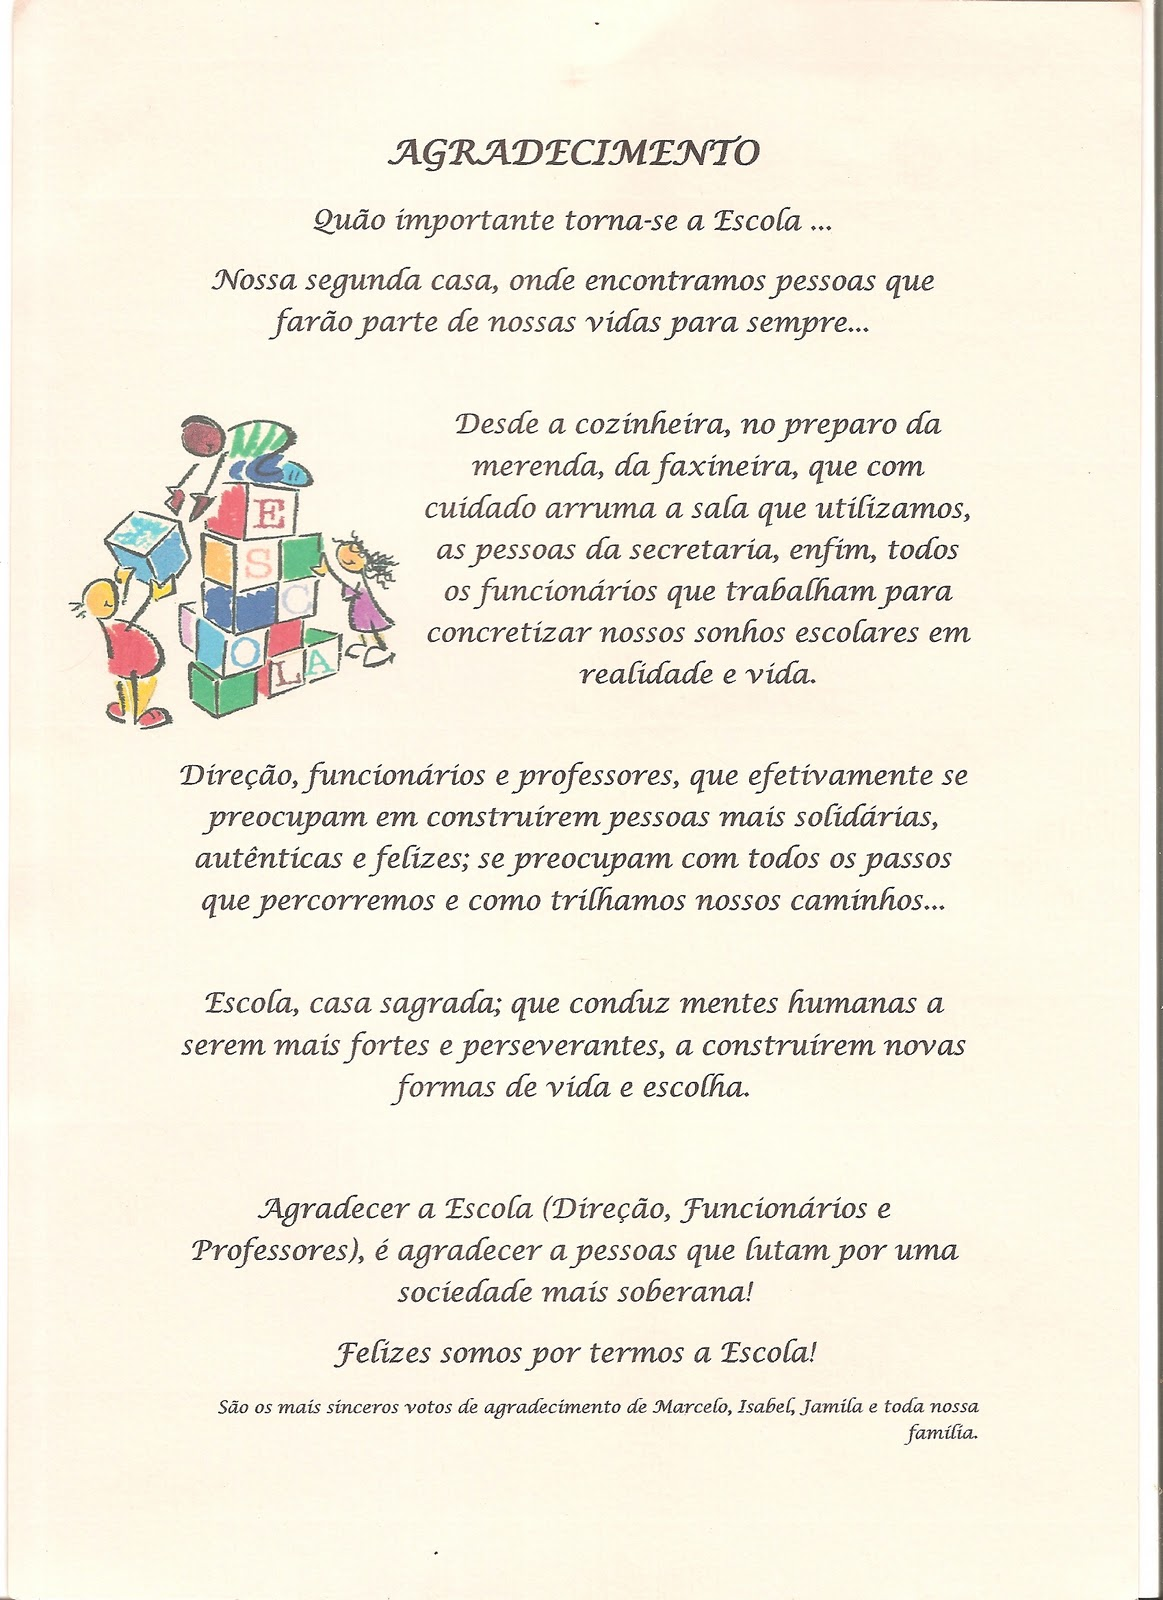 Frases de Agradecimento Profissional | Bilibio